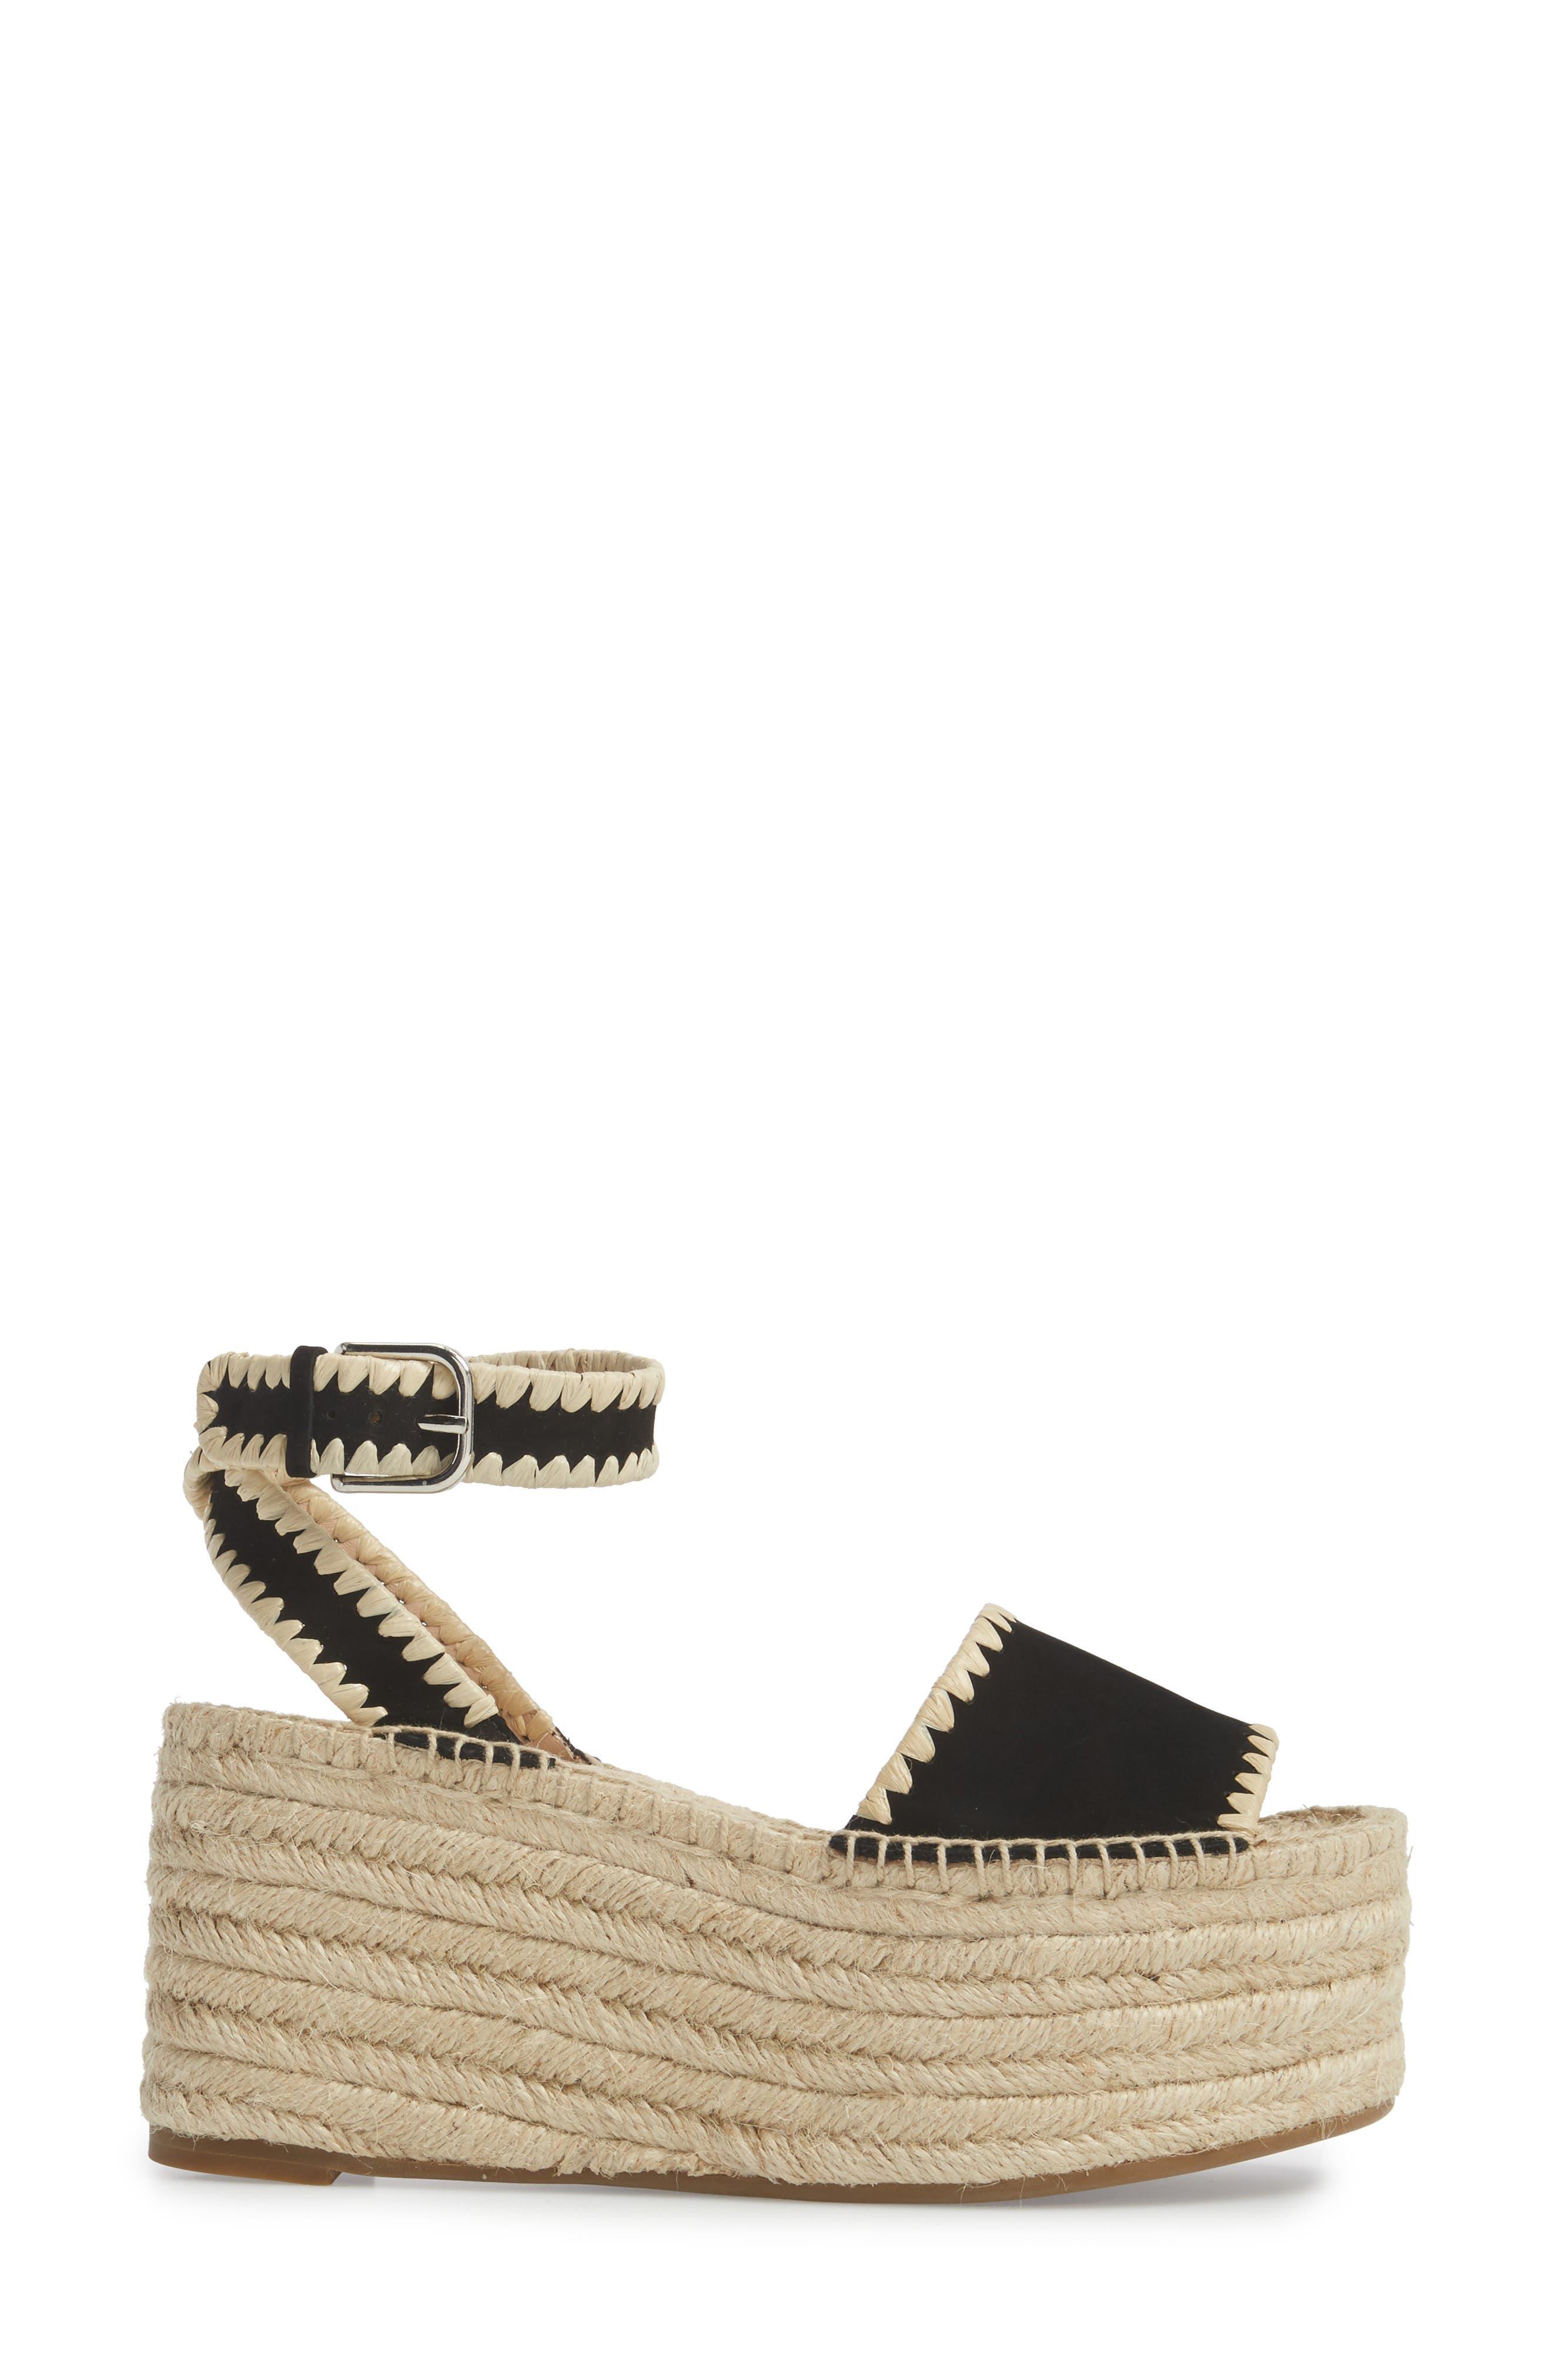 Ria Espadrille Platform Sandal,                             Alternate thumbnail 3, color,                             Black Leather